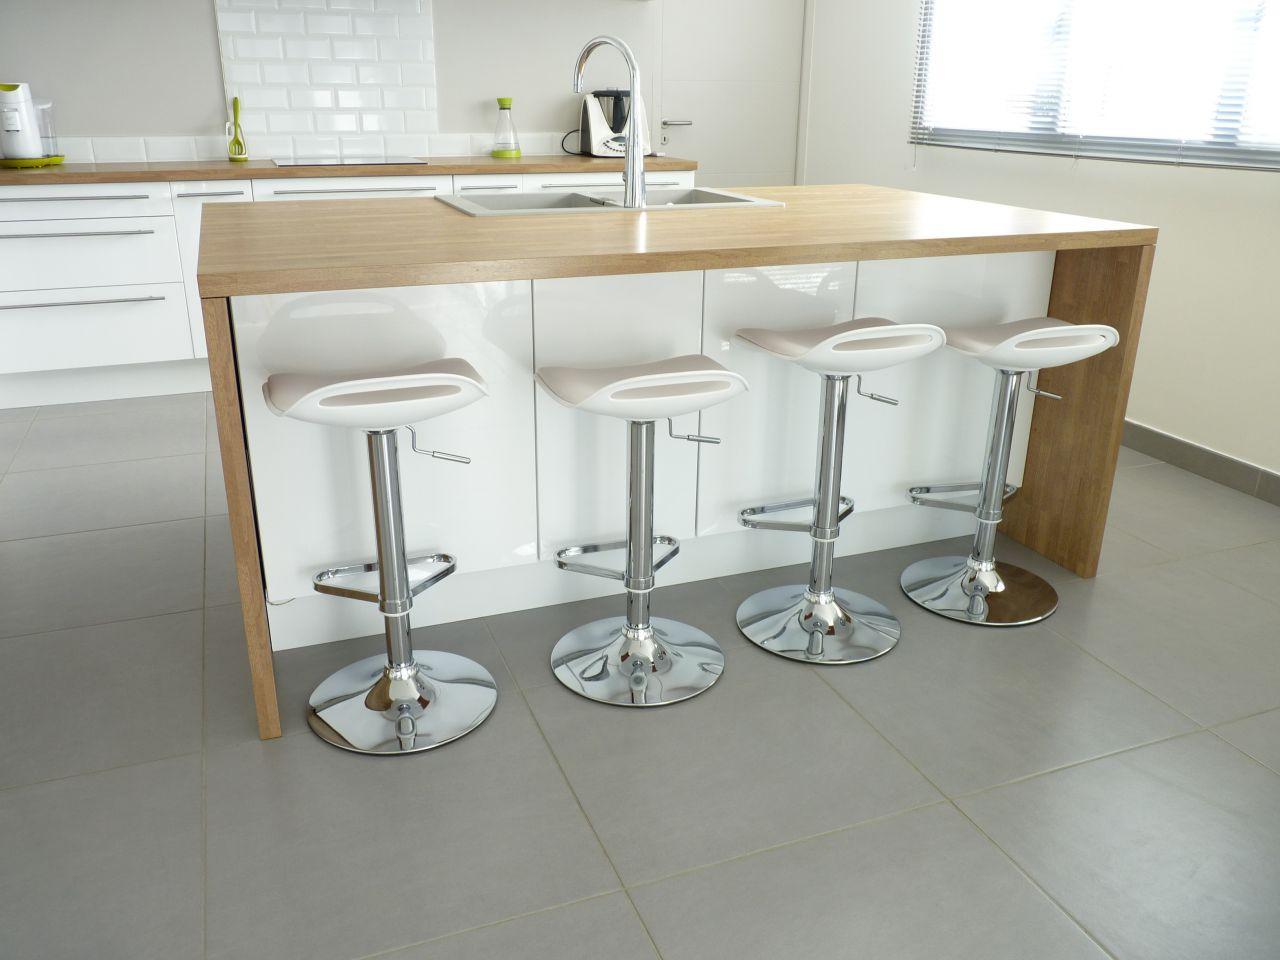 Meuble cuisine blanc et bois id e pour cuisine - Idee meuble cuisine ...